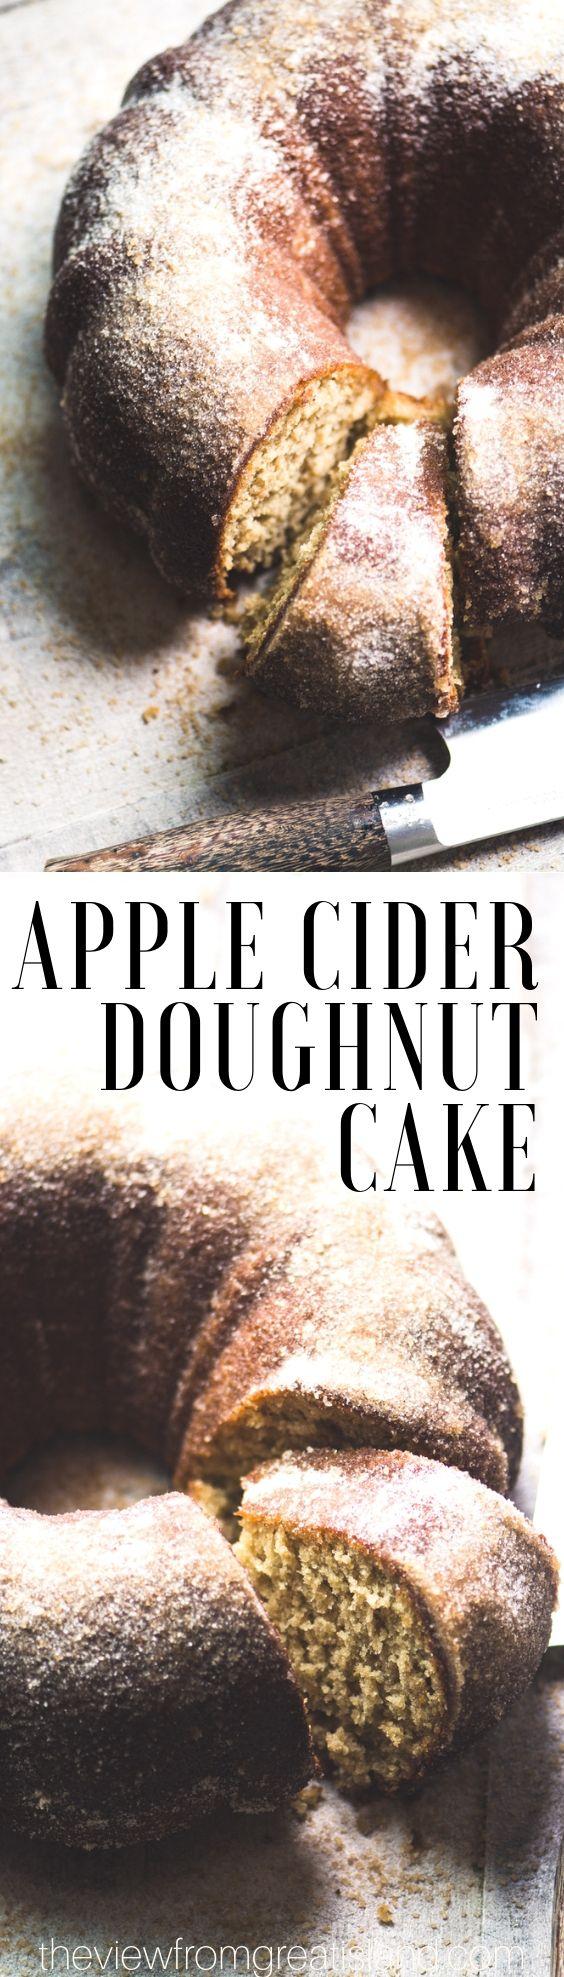 Apple Cider Doughnut Cake ~ a warm cinnamon apple bundt cake that tastes just like the iconic apple cider doughnuts you love.